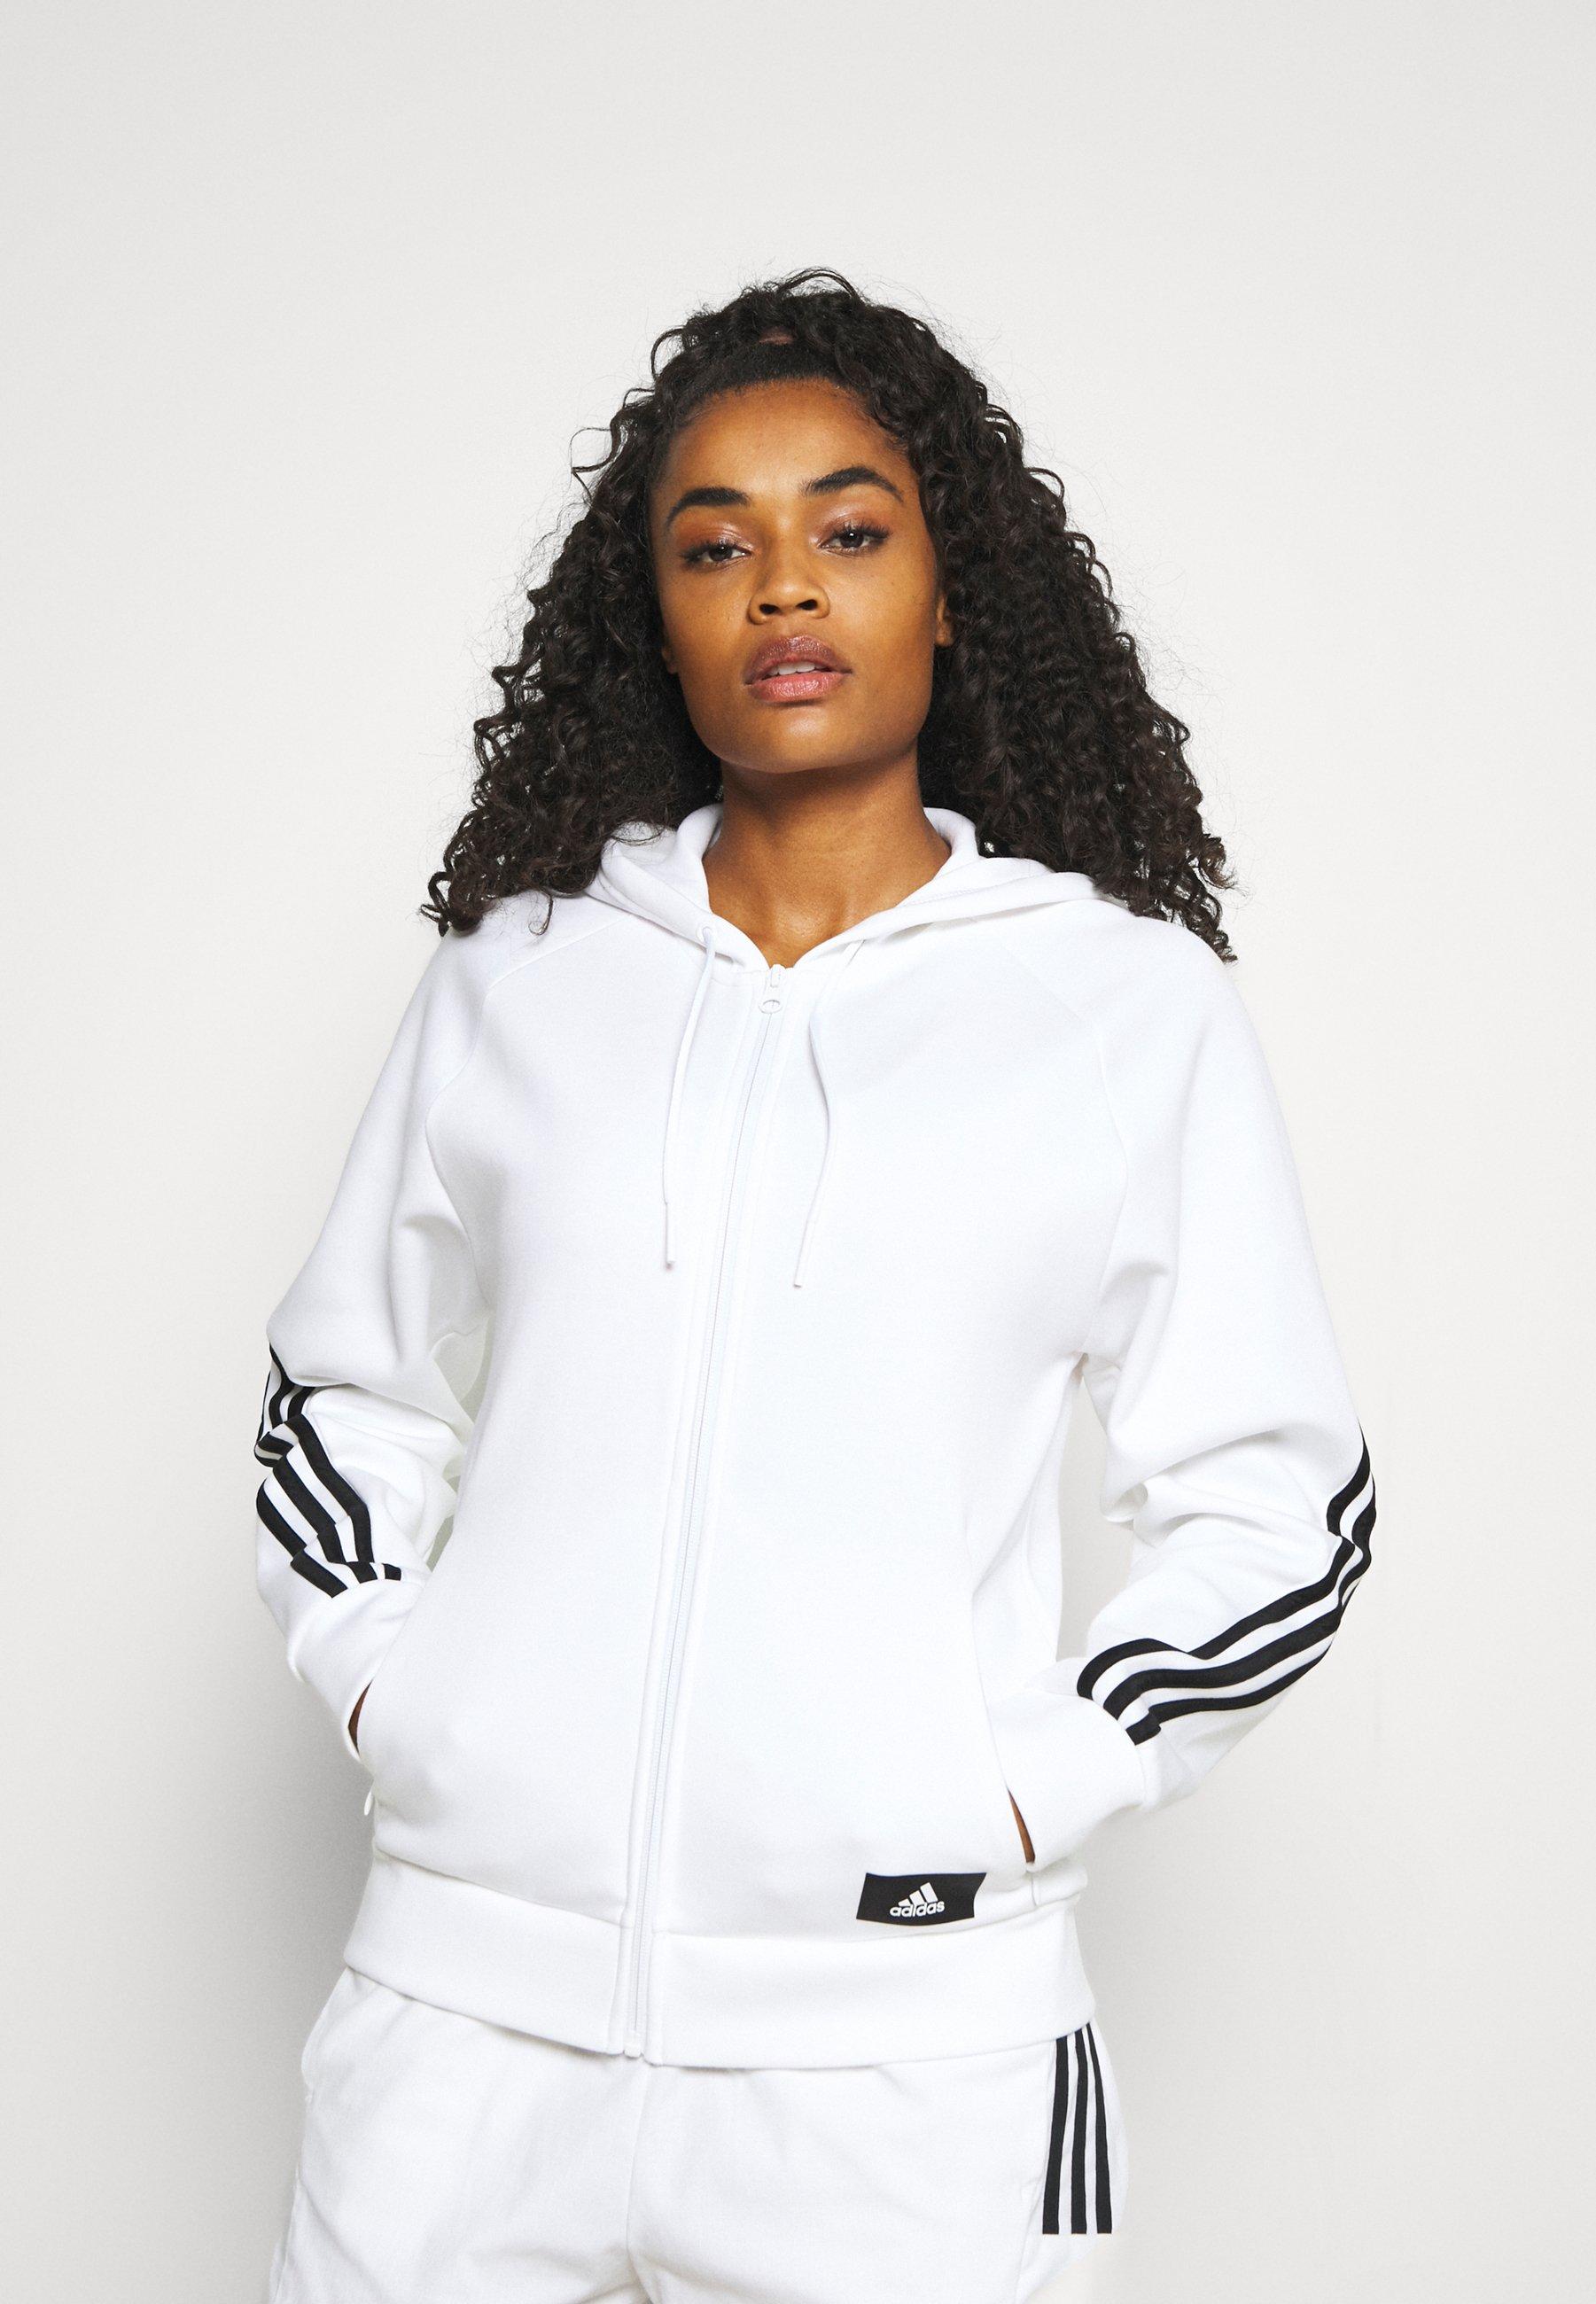 Women FI 3-STRIPES FULL ZIP REG SPORTS FUTURE ICONS PRIMEGREEN TRACK TOP HOODIE - Zip-up sweatshirt